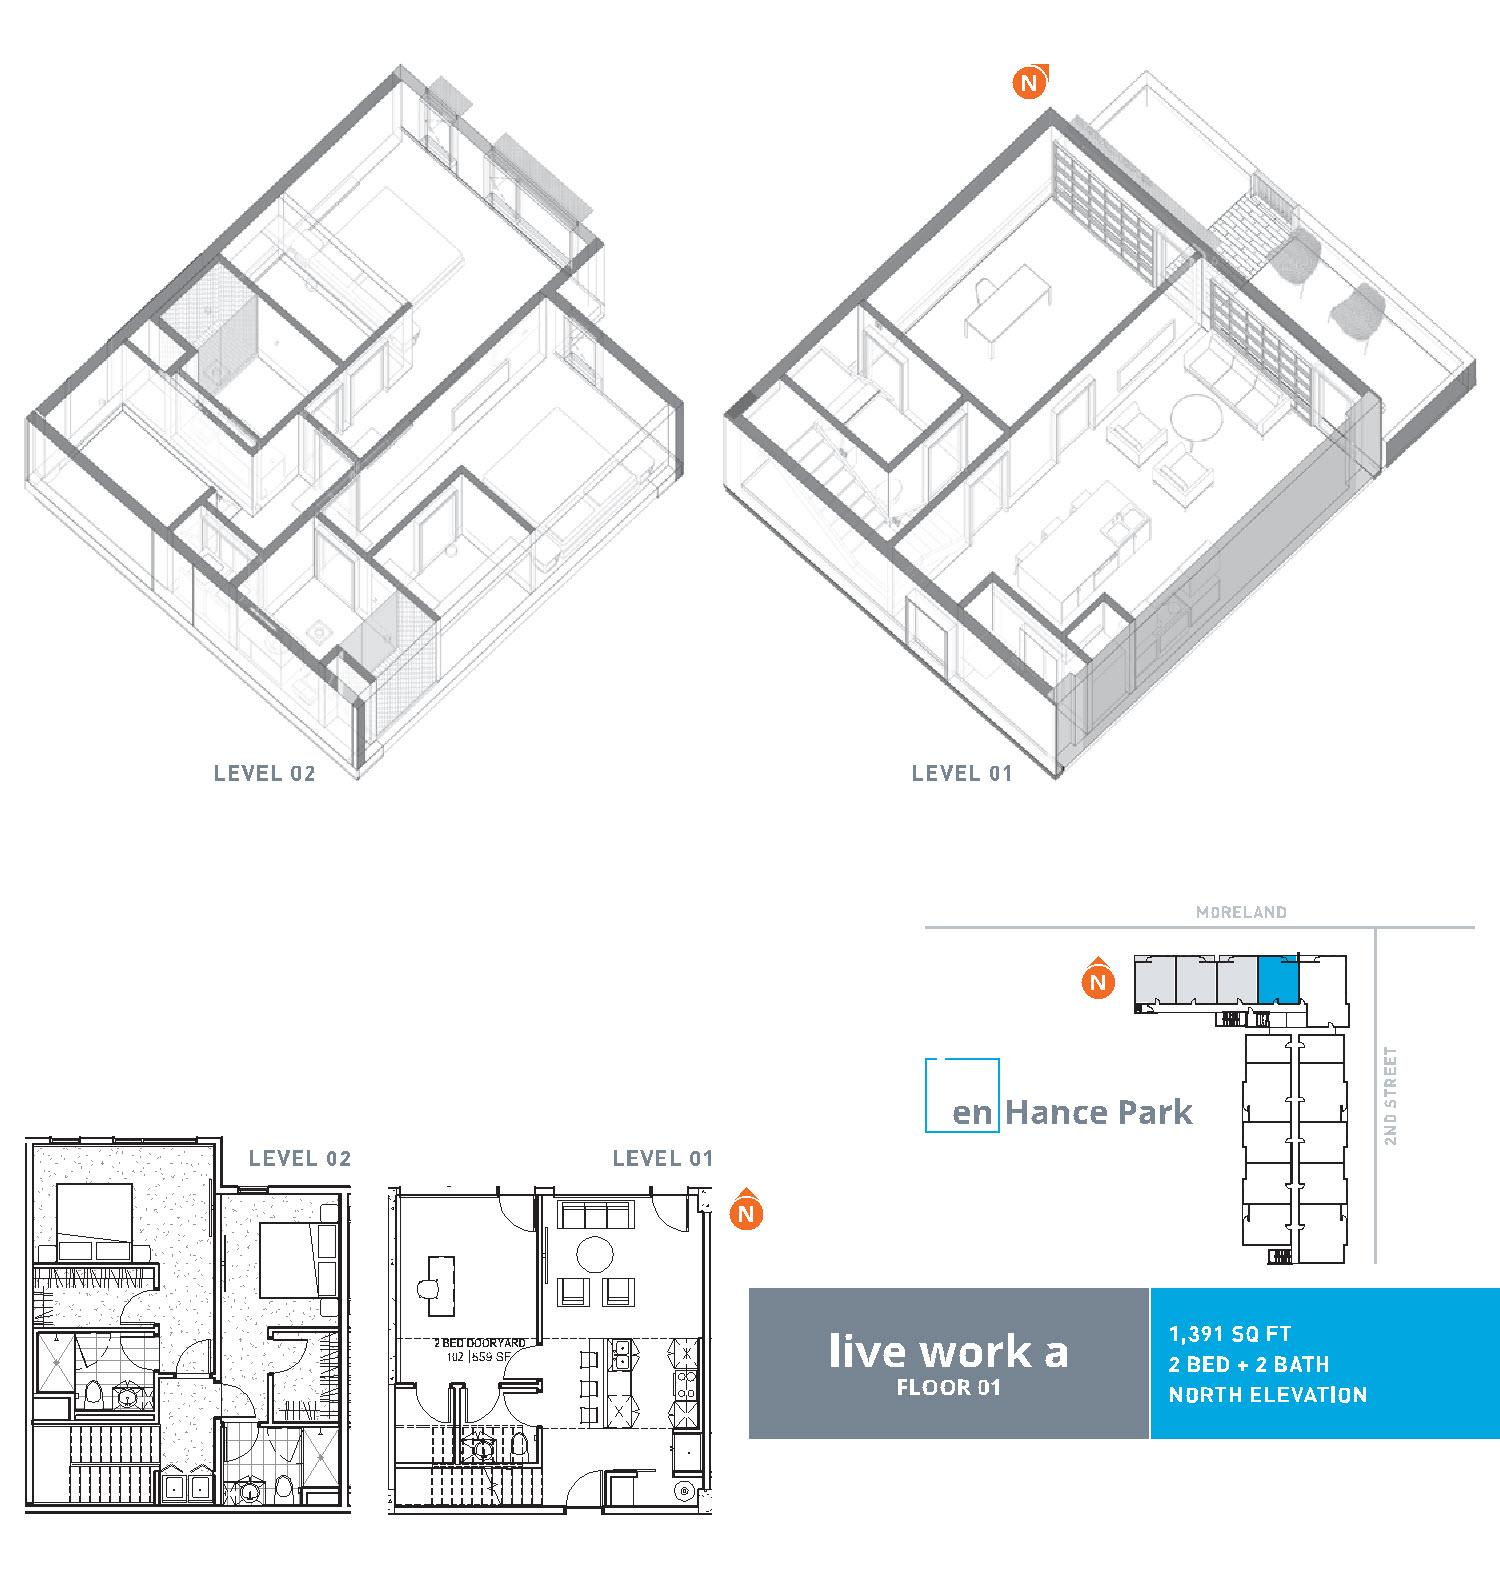 En hance park condo floor plan live work a 2bd